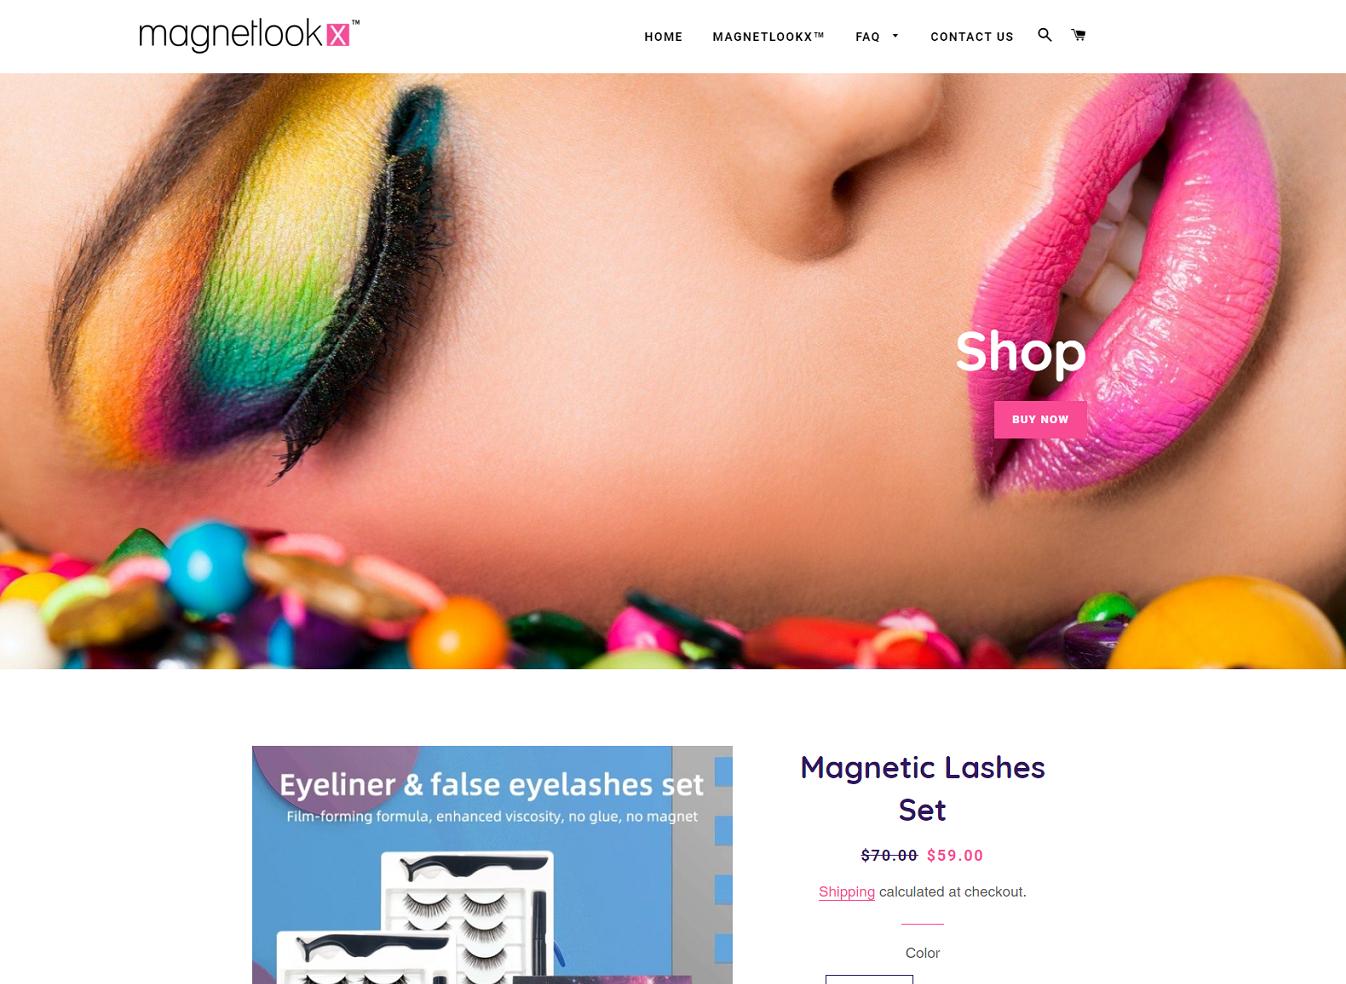 https://magnetic-lashes-store-x.myshopify.com/